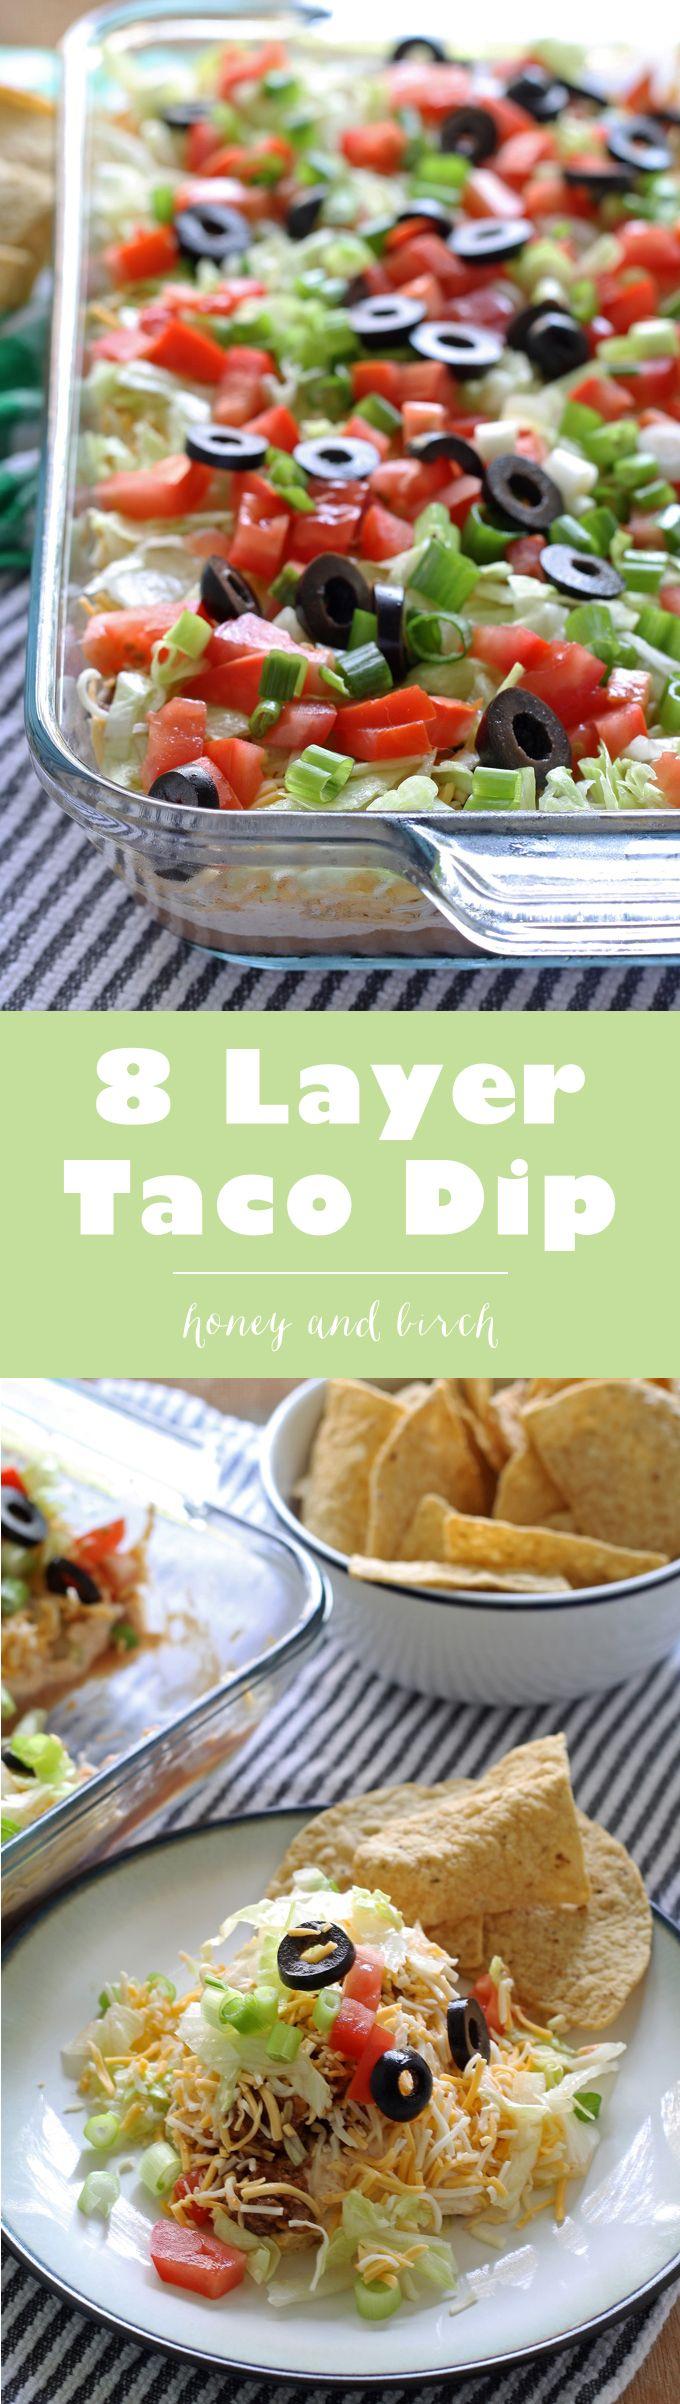 8 Layer Taco Dip Appetizer Honey And Birch Layered Taco Dip Taco Dip Recipe Recipes